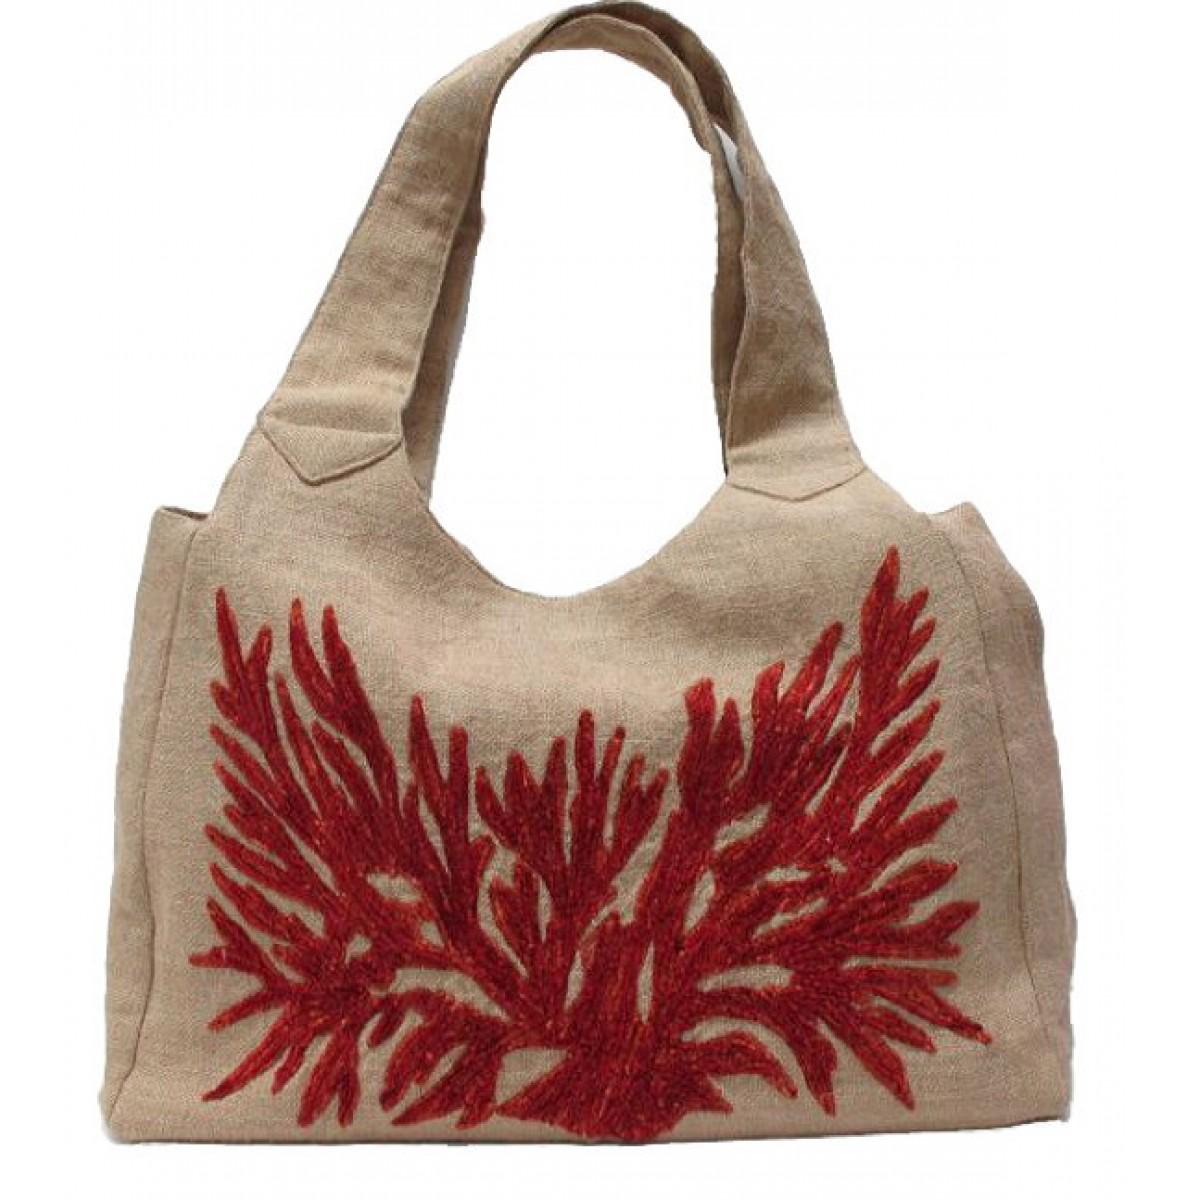 Large Jute Bag with Coral Reef Motif